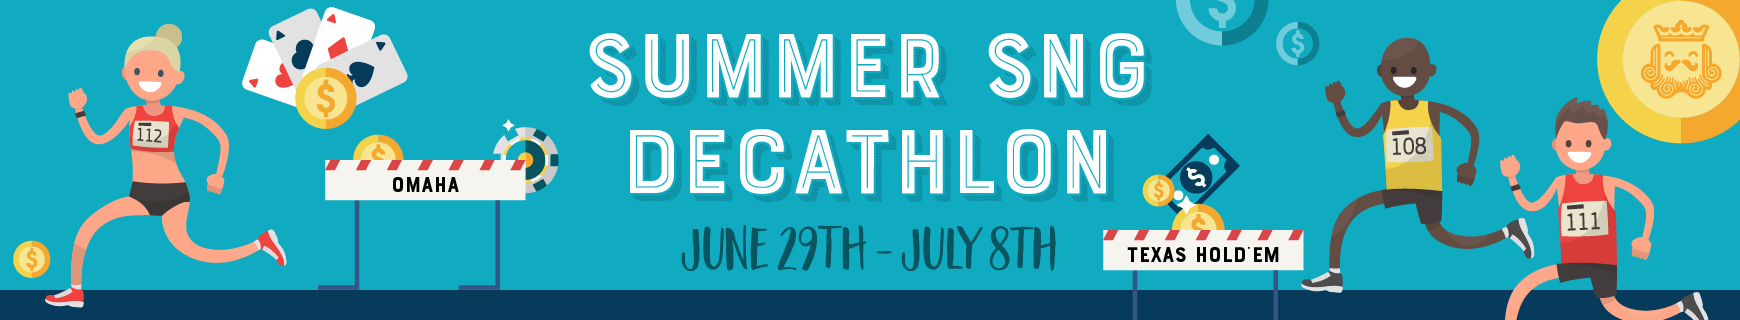 Summer sng decathlon %28870 x 160%29 2x